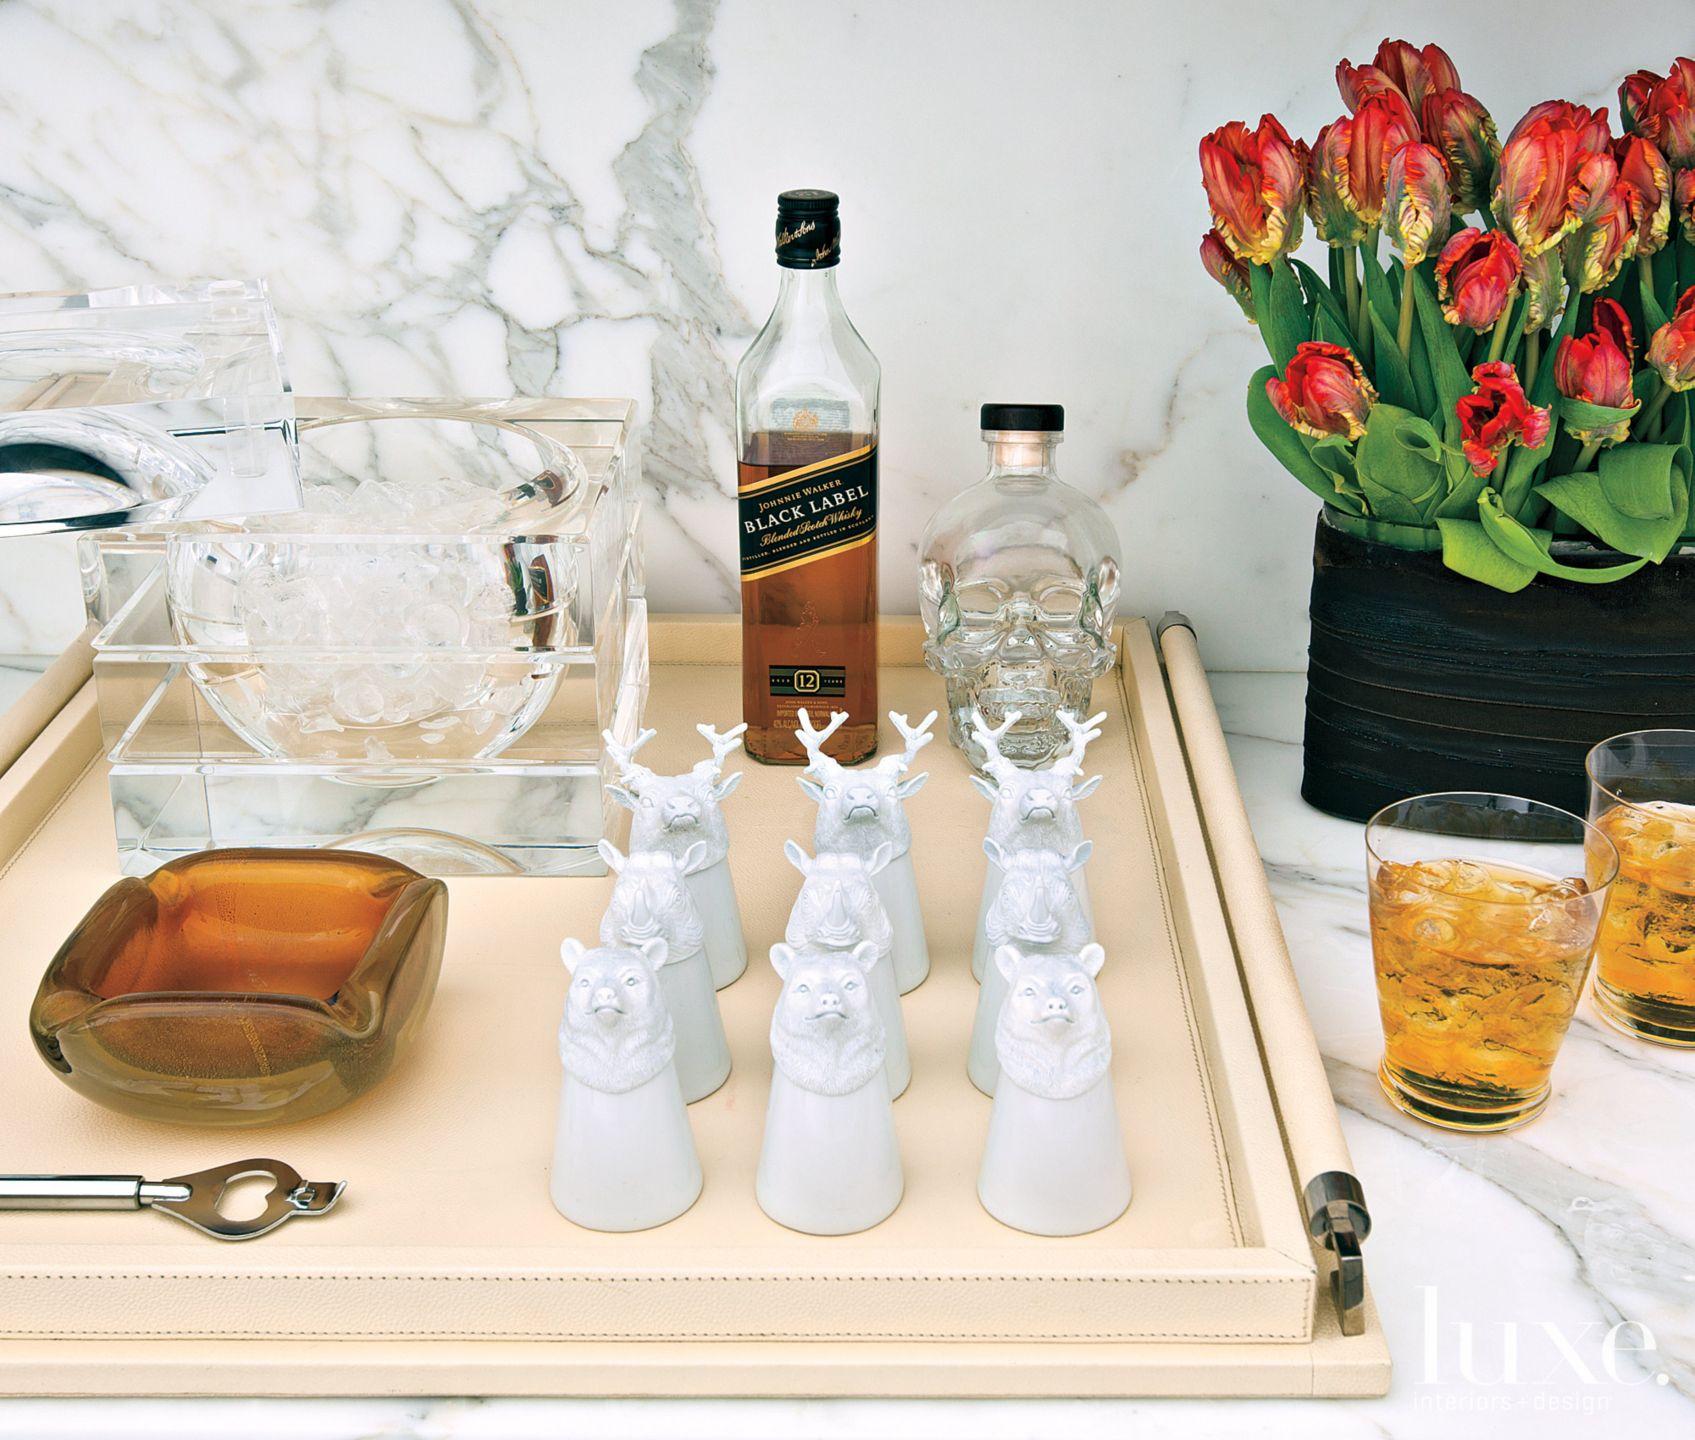 Modern Bar Set and Tray